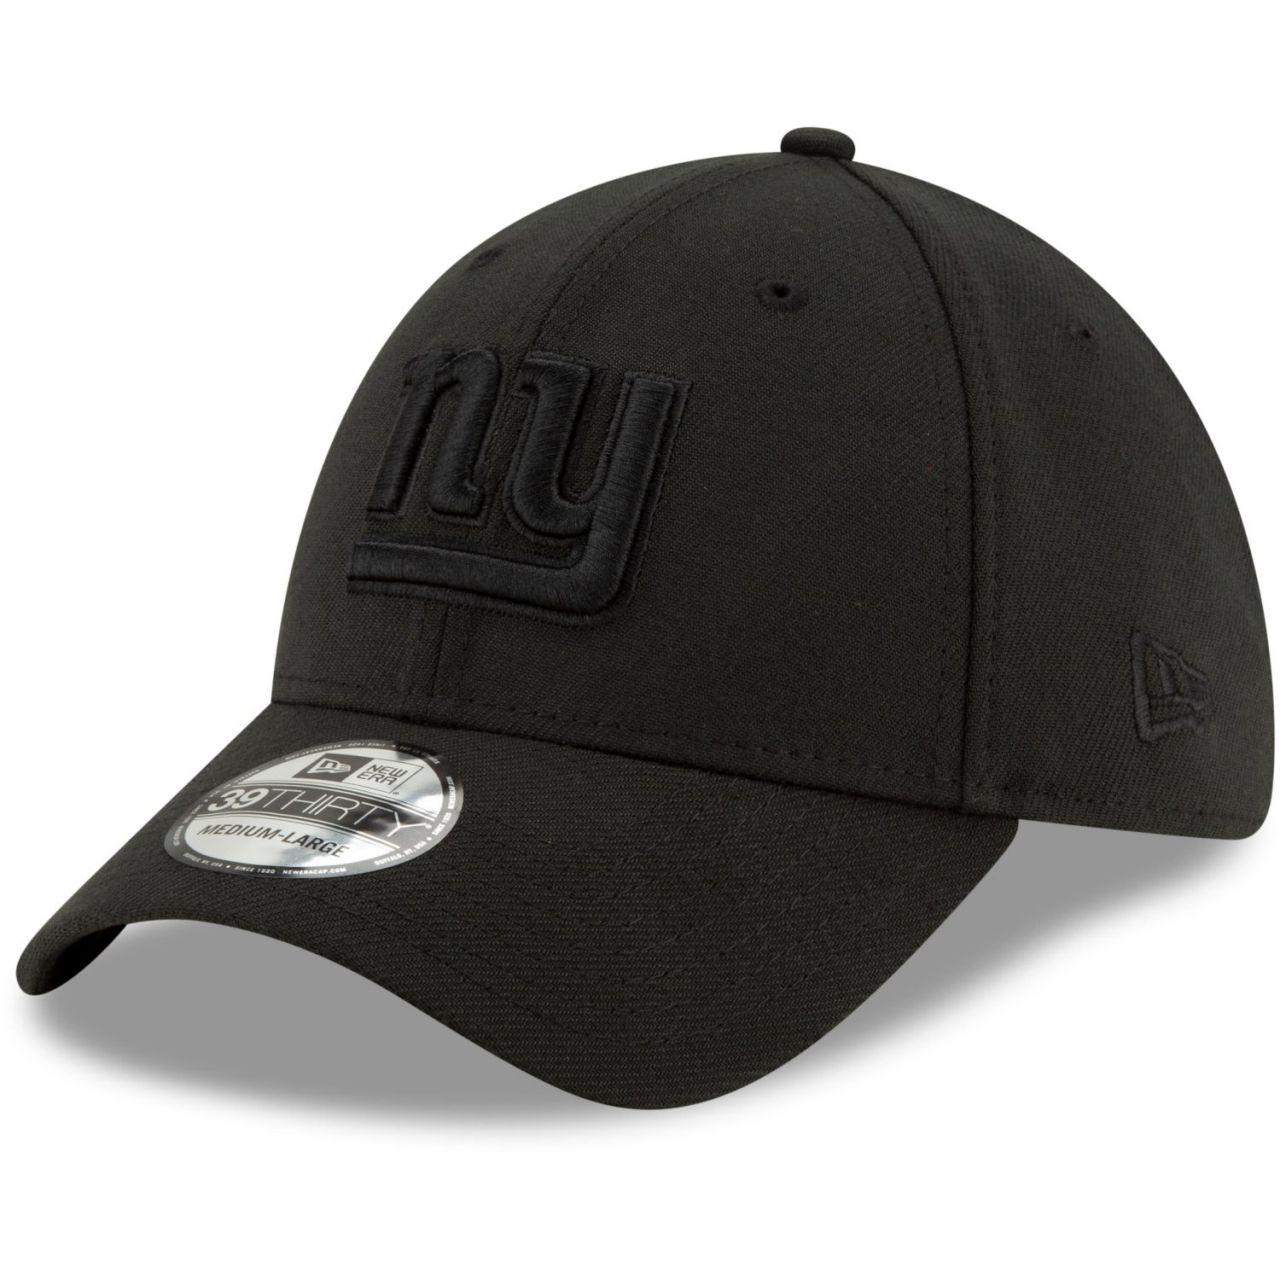 amfoo - New Era 39Thirty Stretch Cap - NFL New York Giants